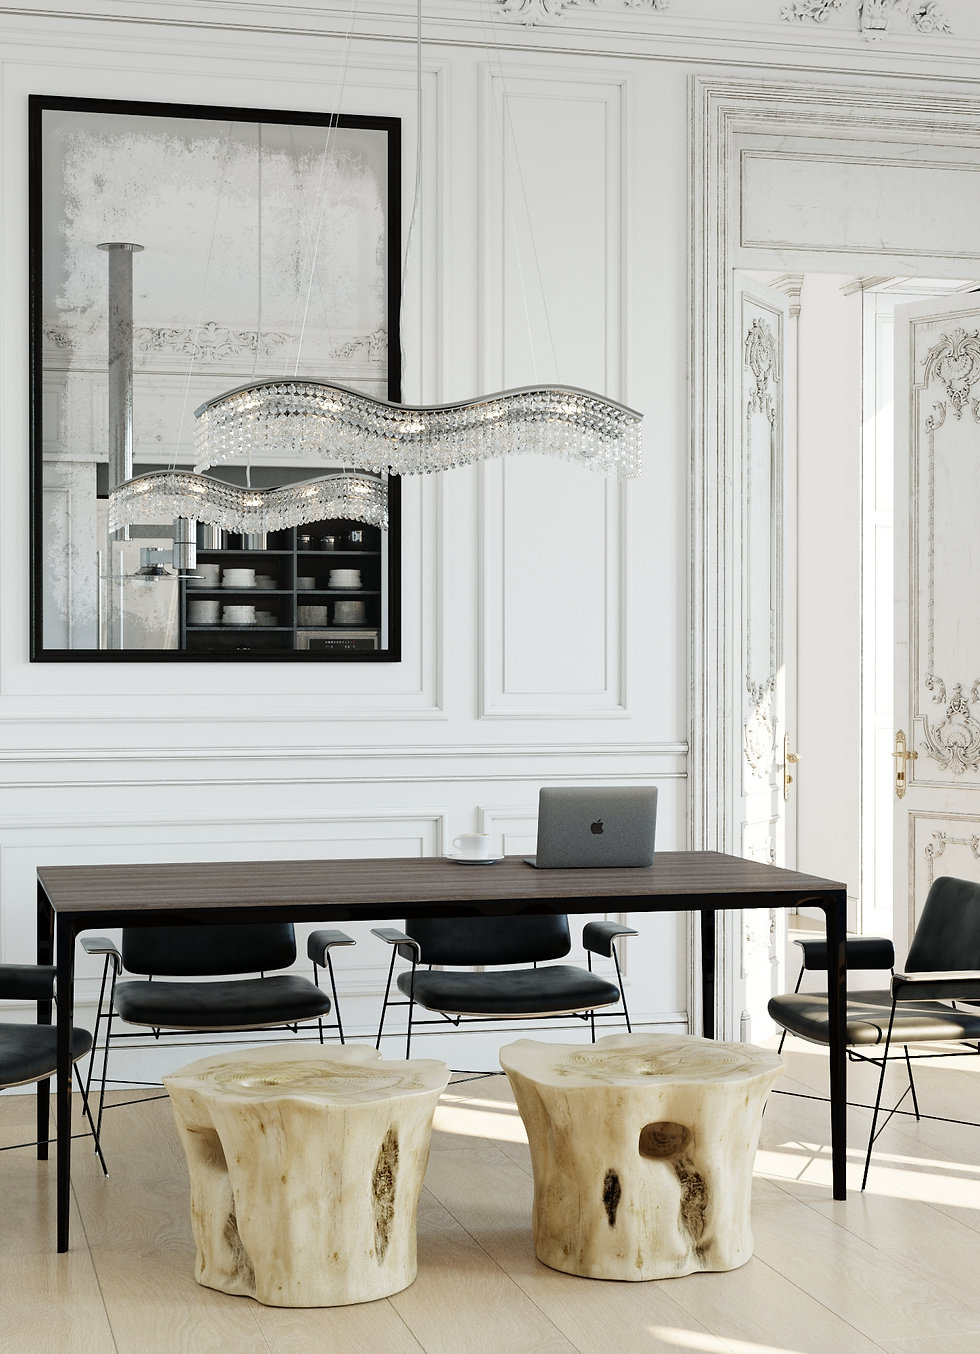 интерьер во французском стиле